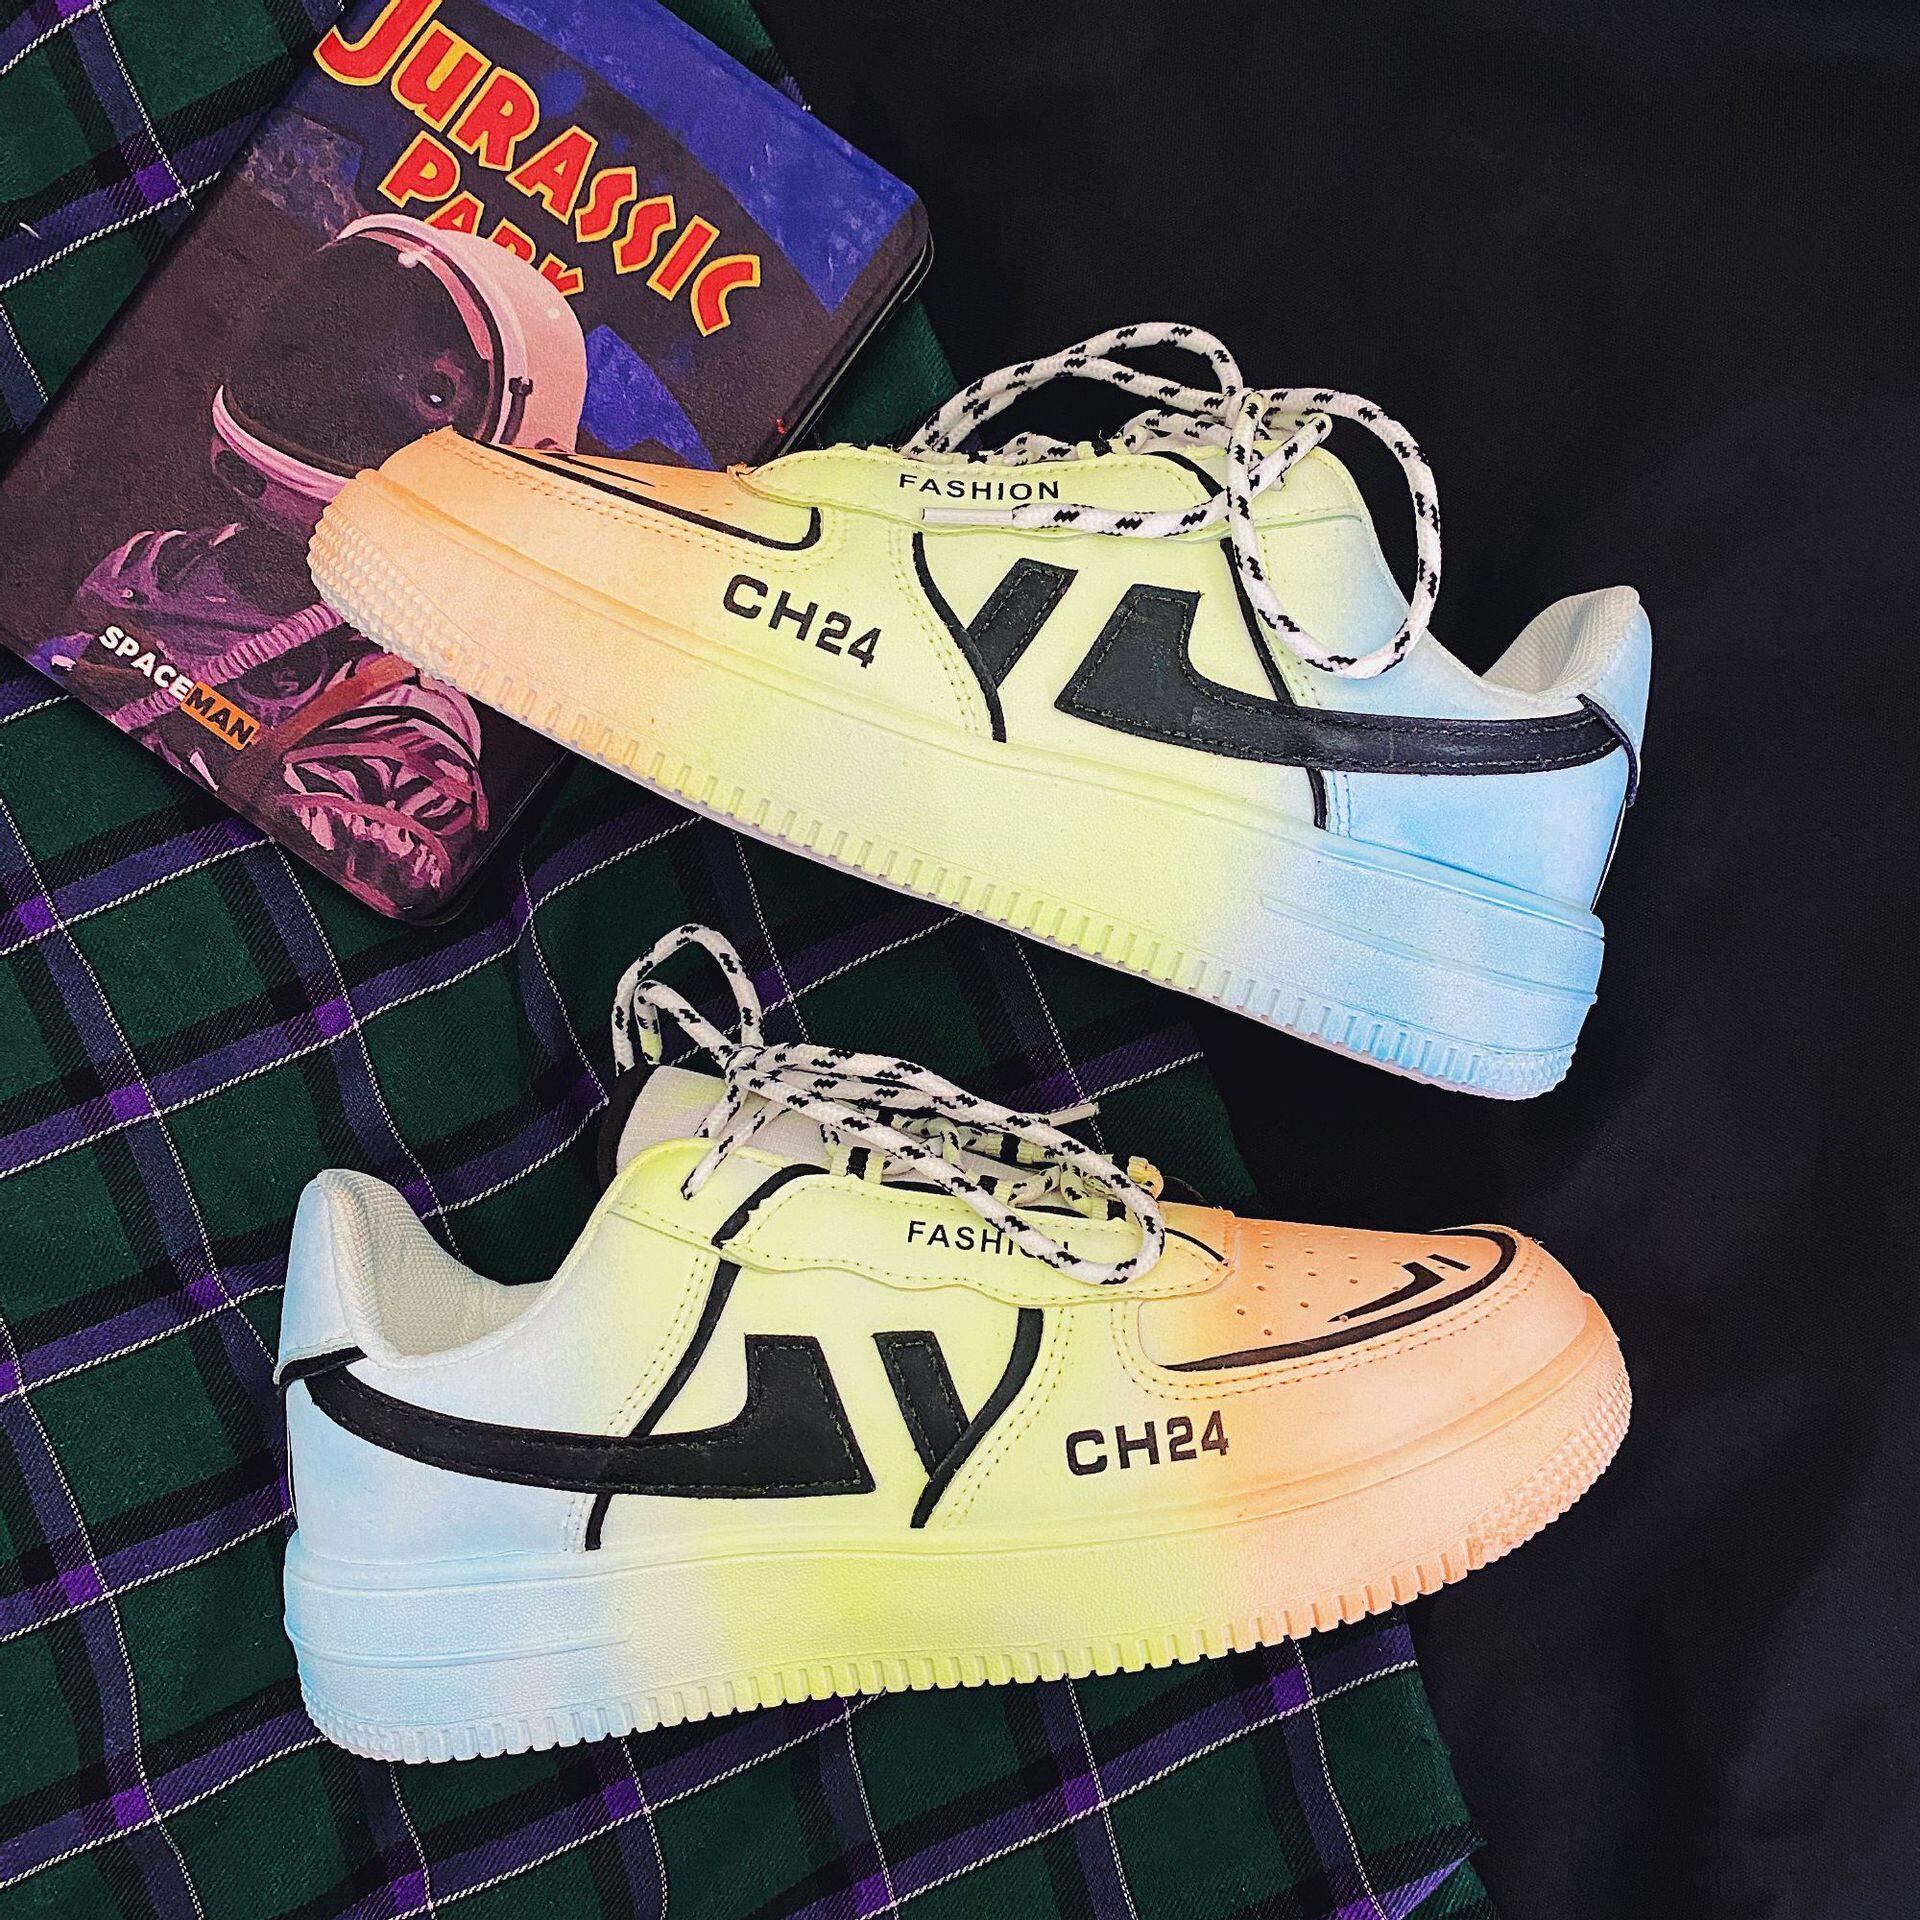 XZ517-1 XZ016 P60秋季新款ins超火板鞋休闲FB原宿学生运动鞋男 XZ517-1 XZ016 P60